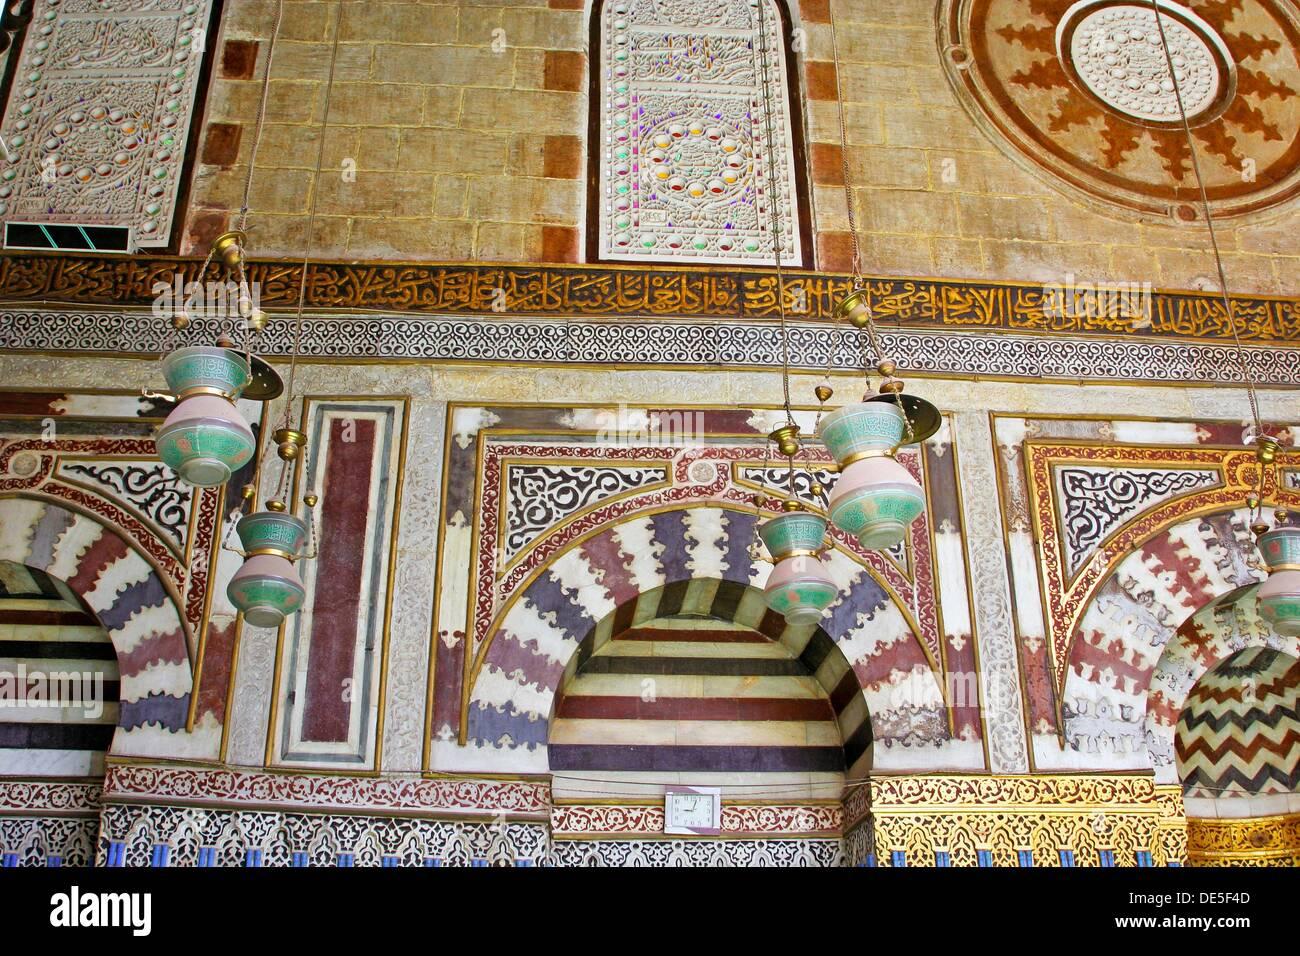 Jamal al-Din Yusuf Al estadar Mosque cairo, Egypt - Stock Image